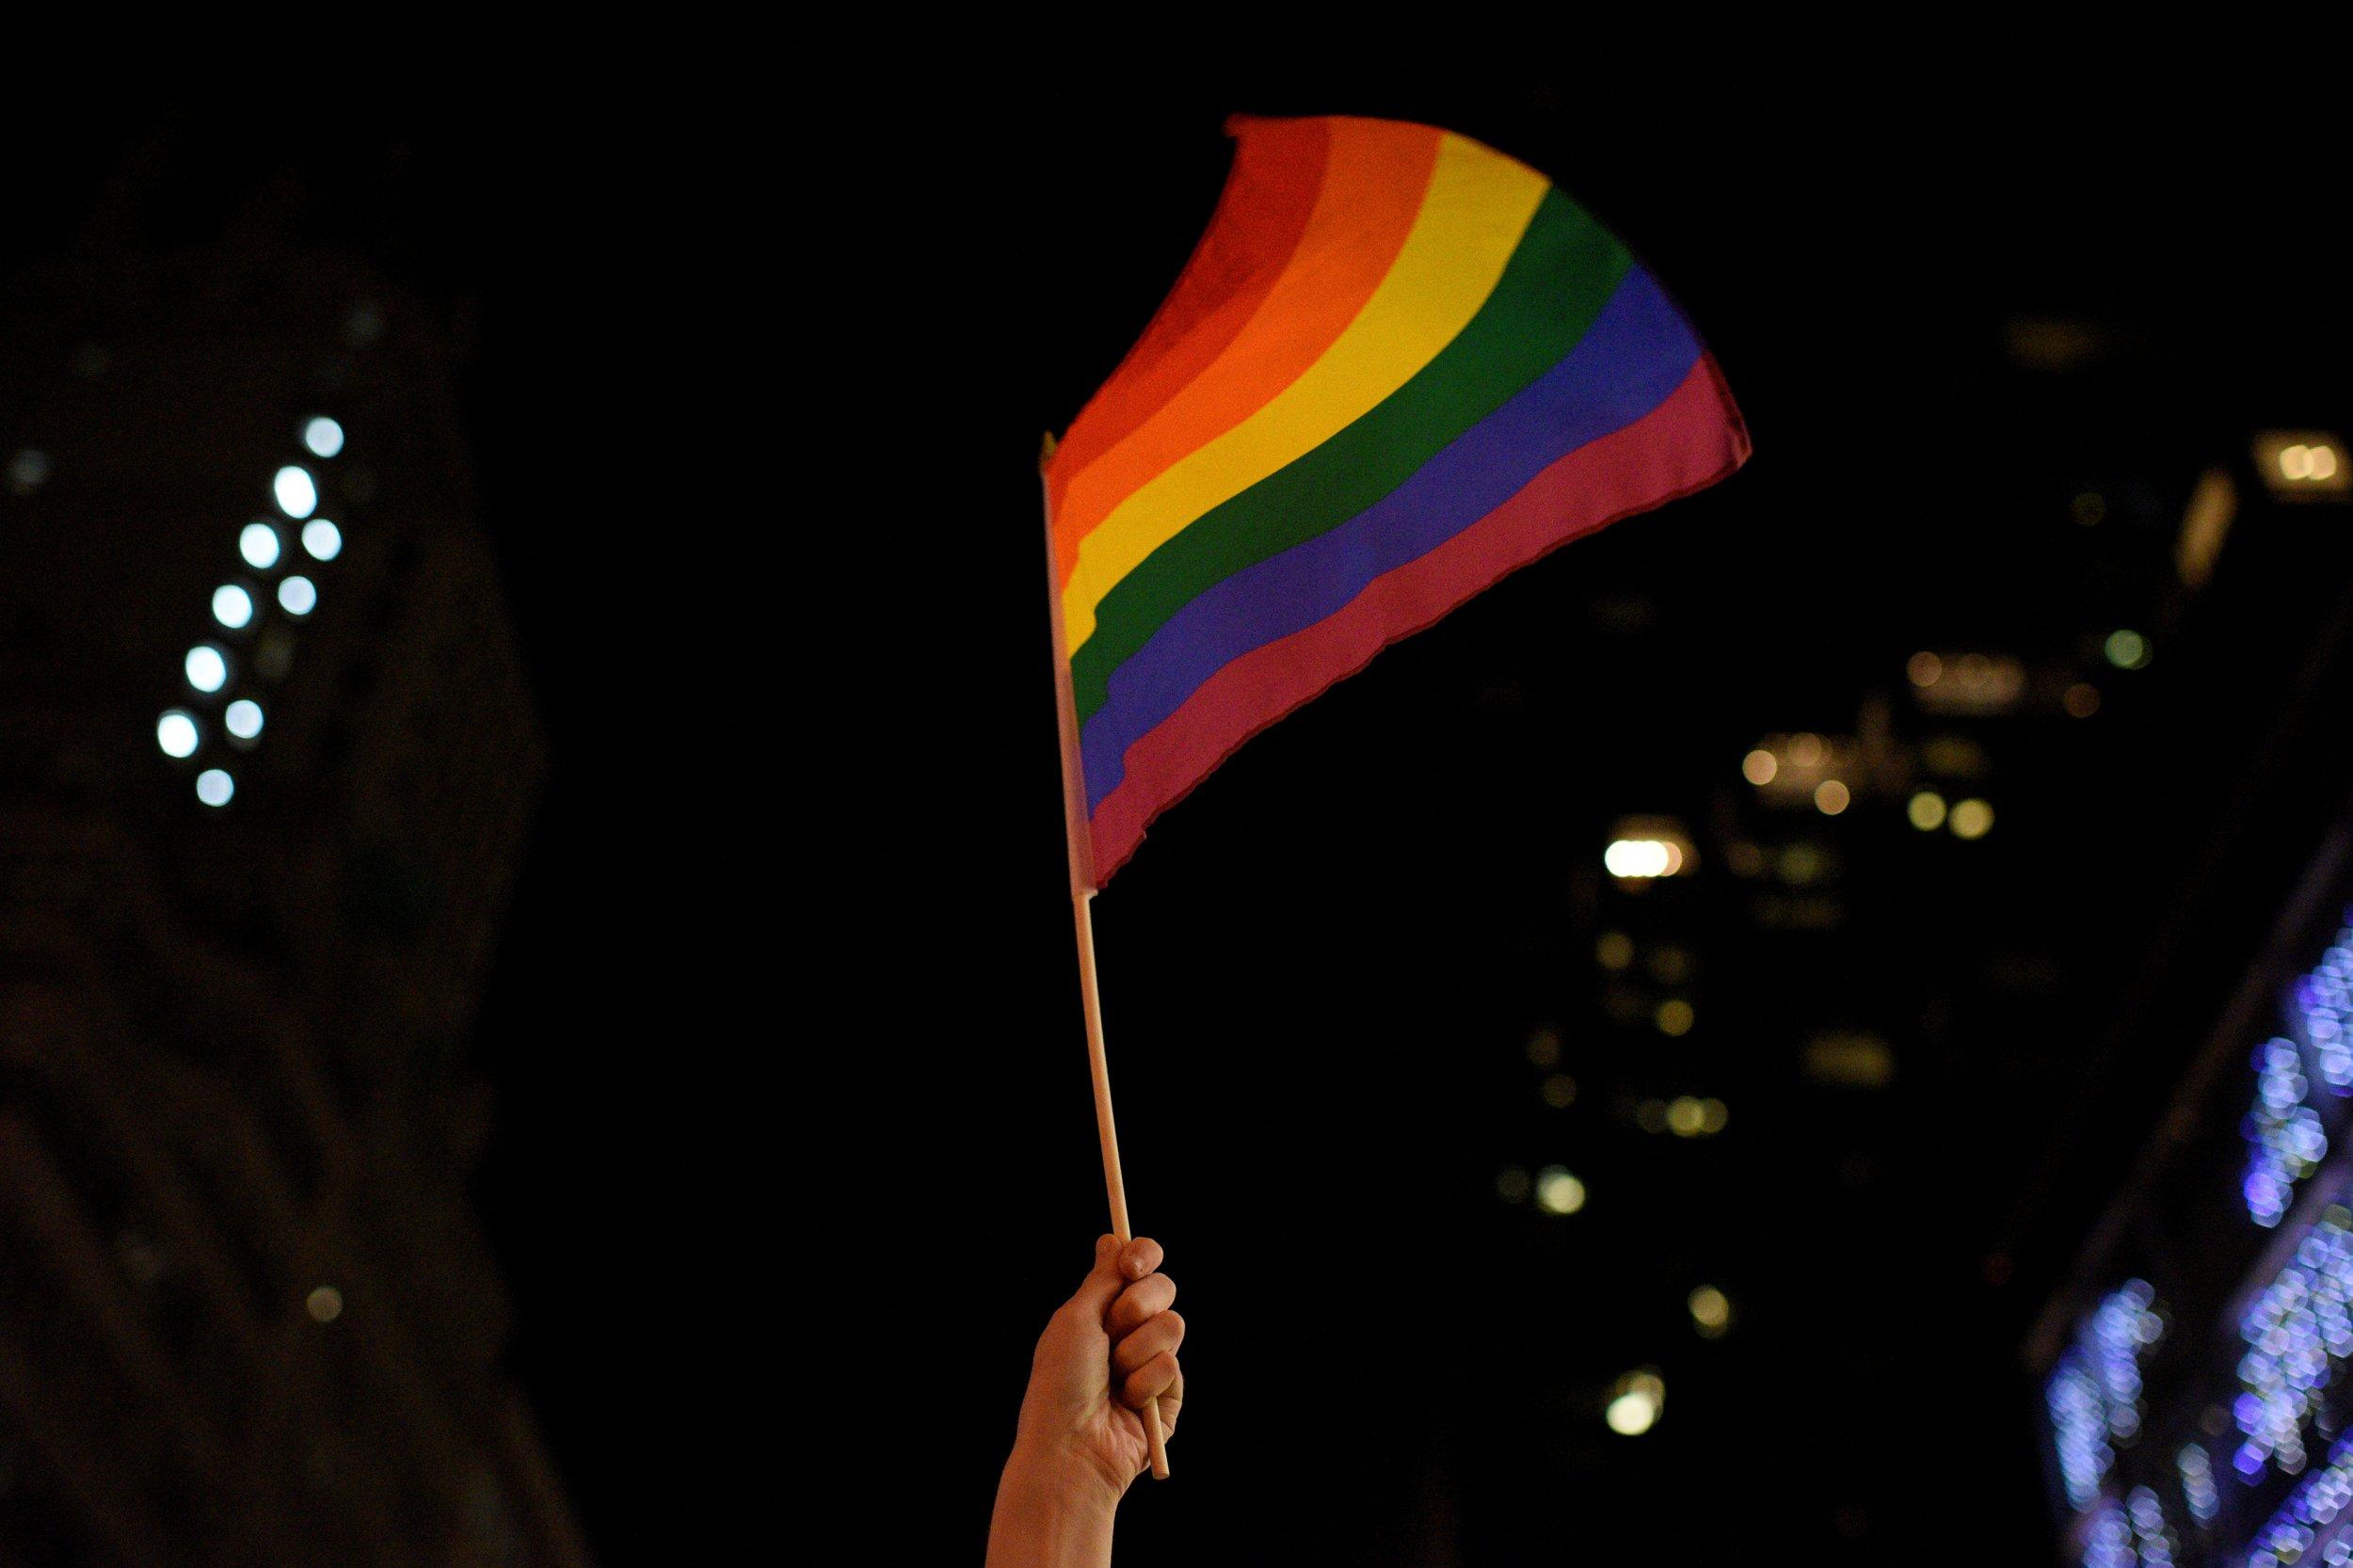 Rainbow flag, LGBT rights, Donald Trump